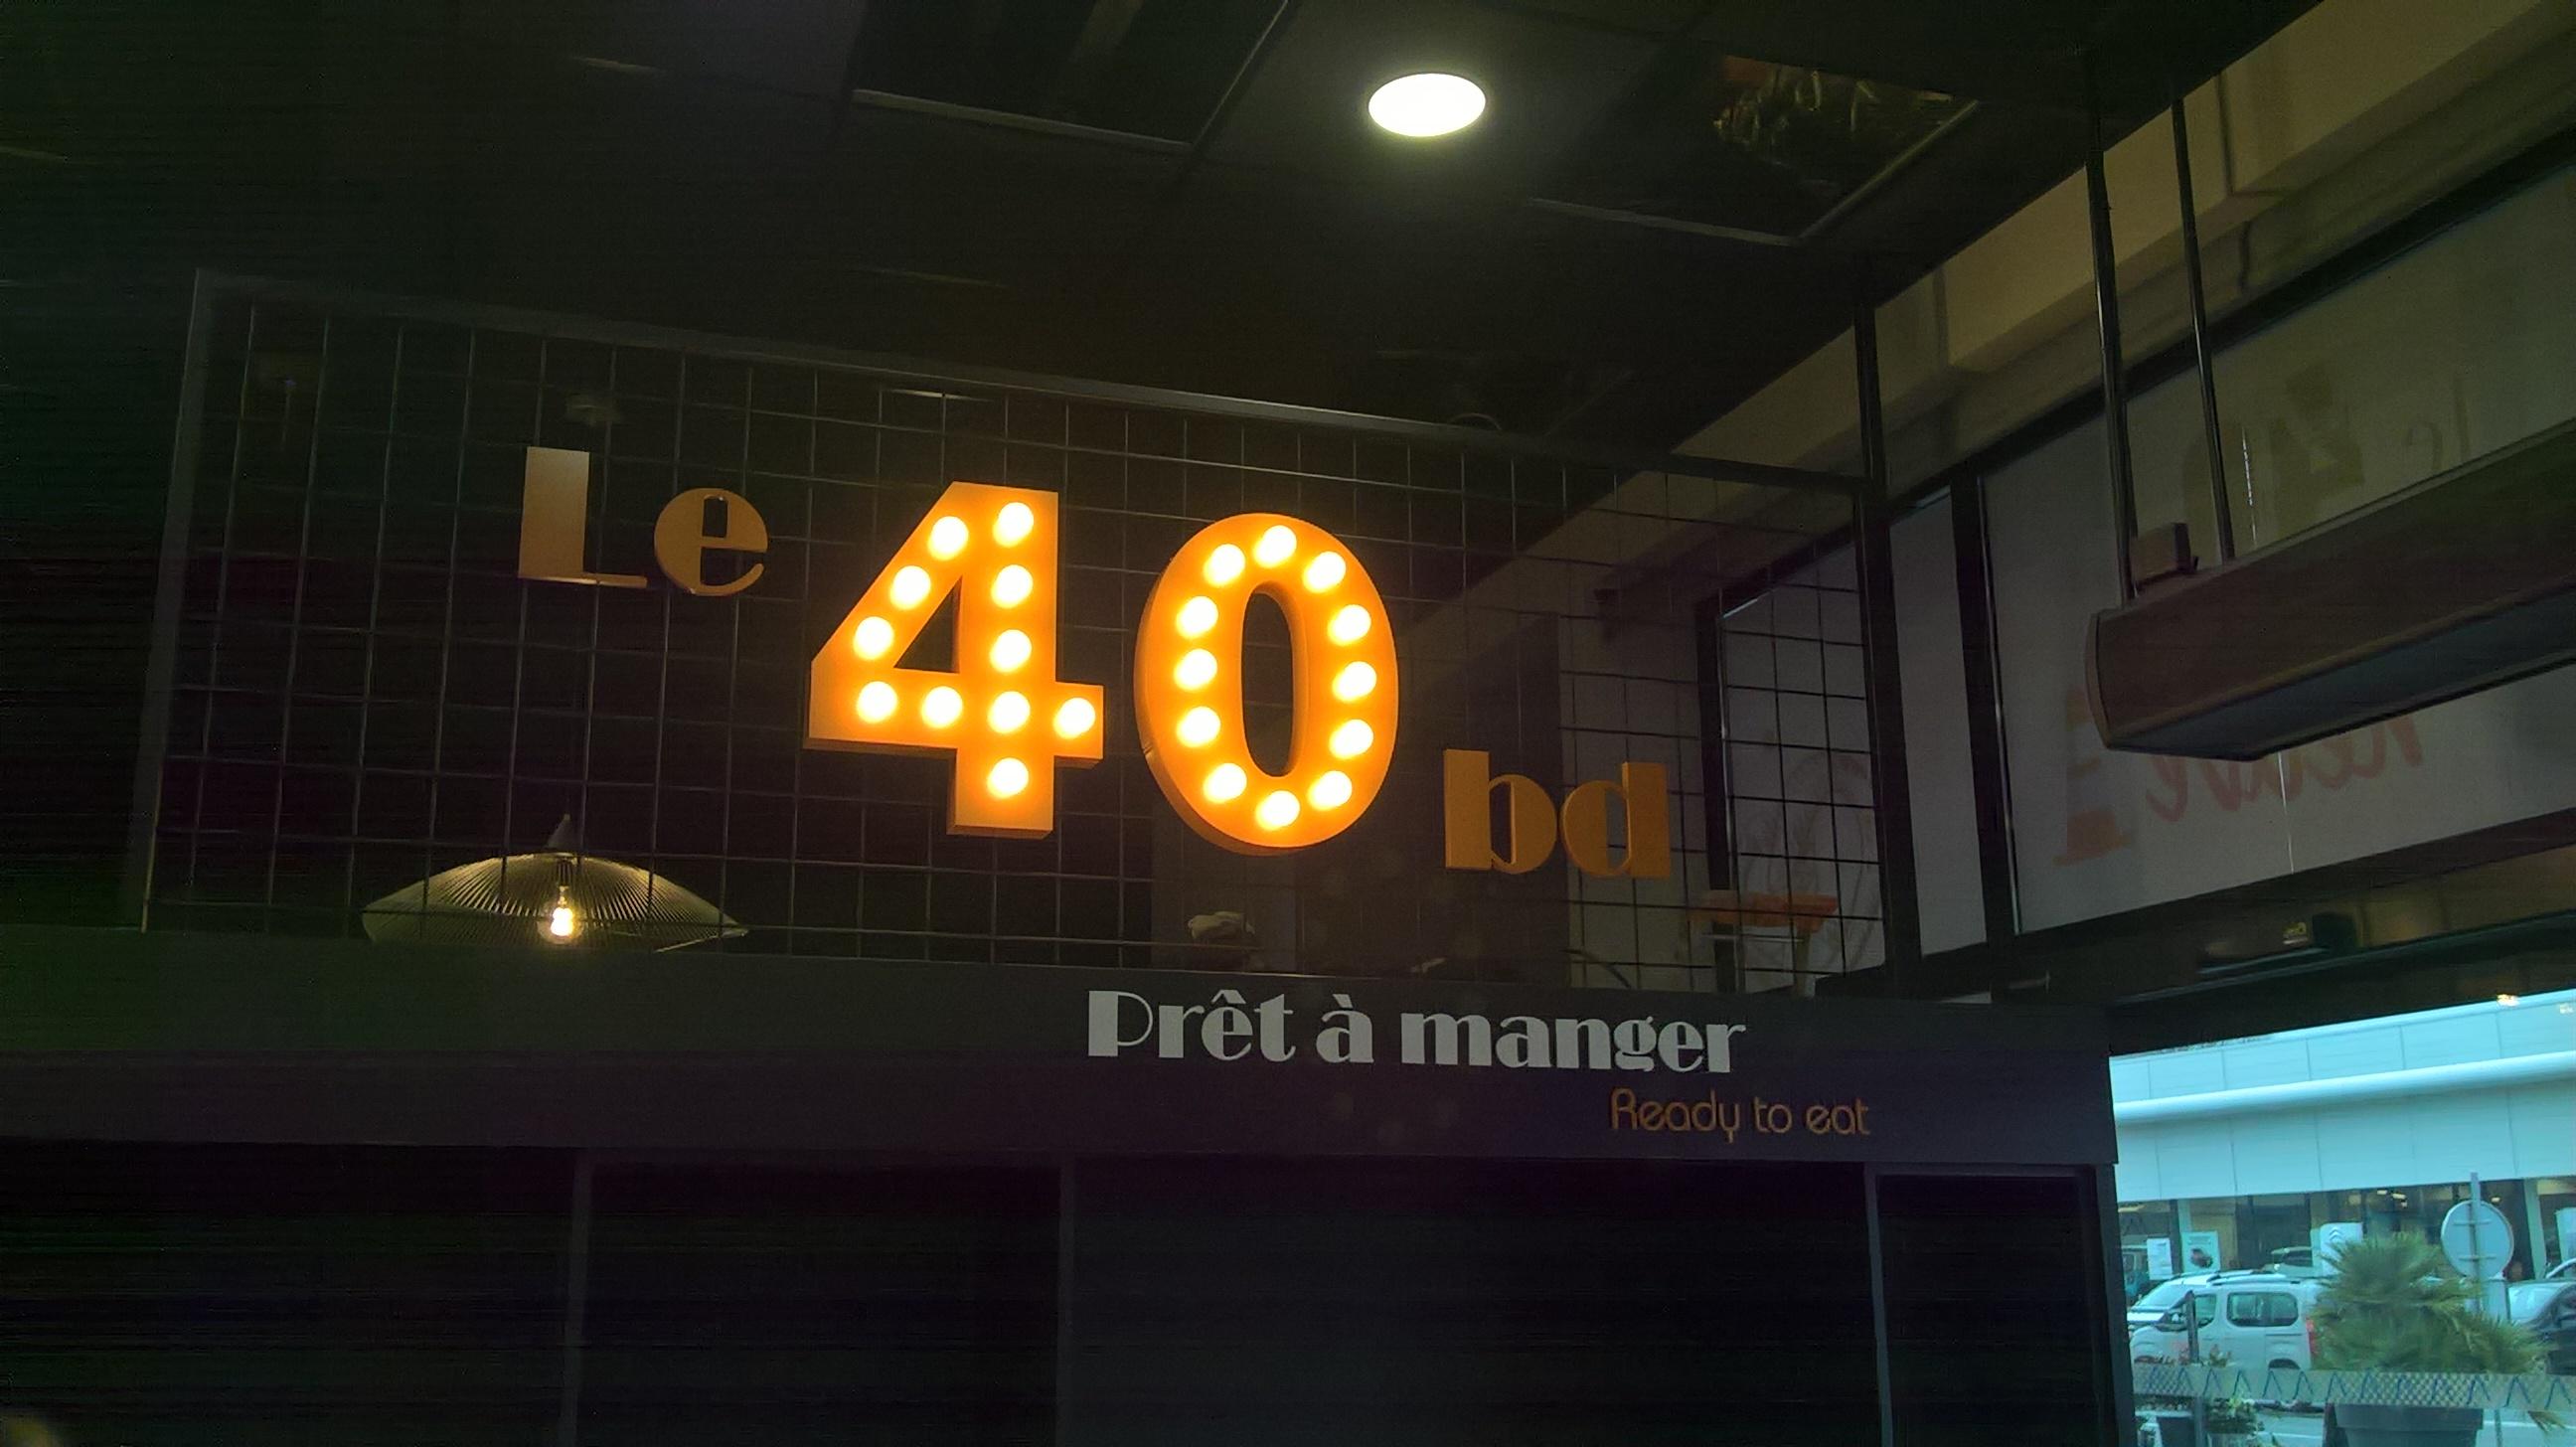 Le 40 BD